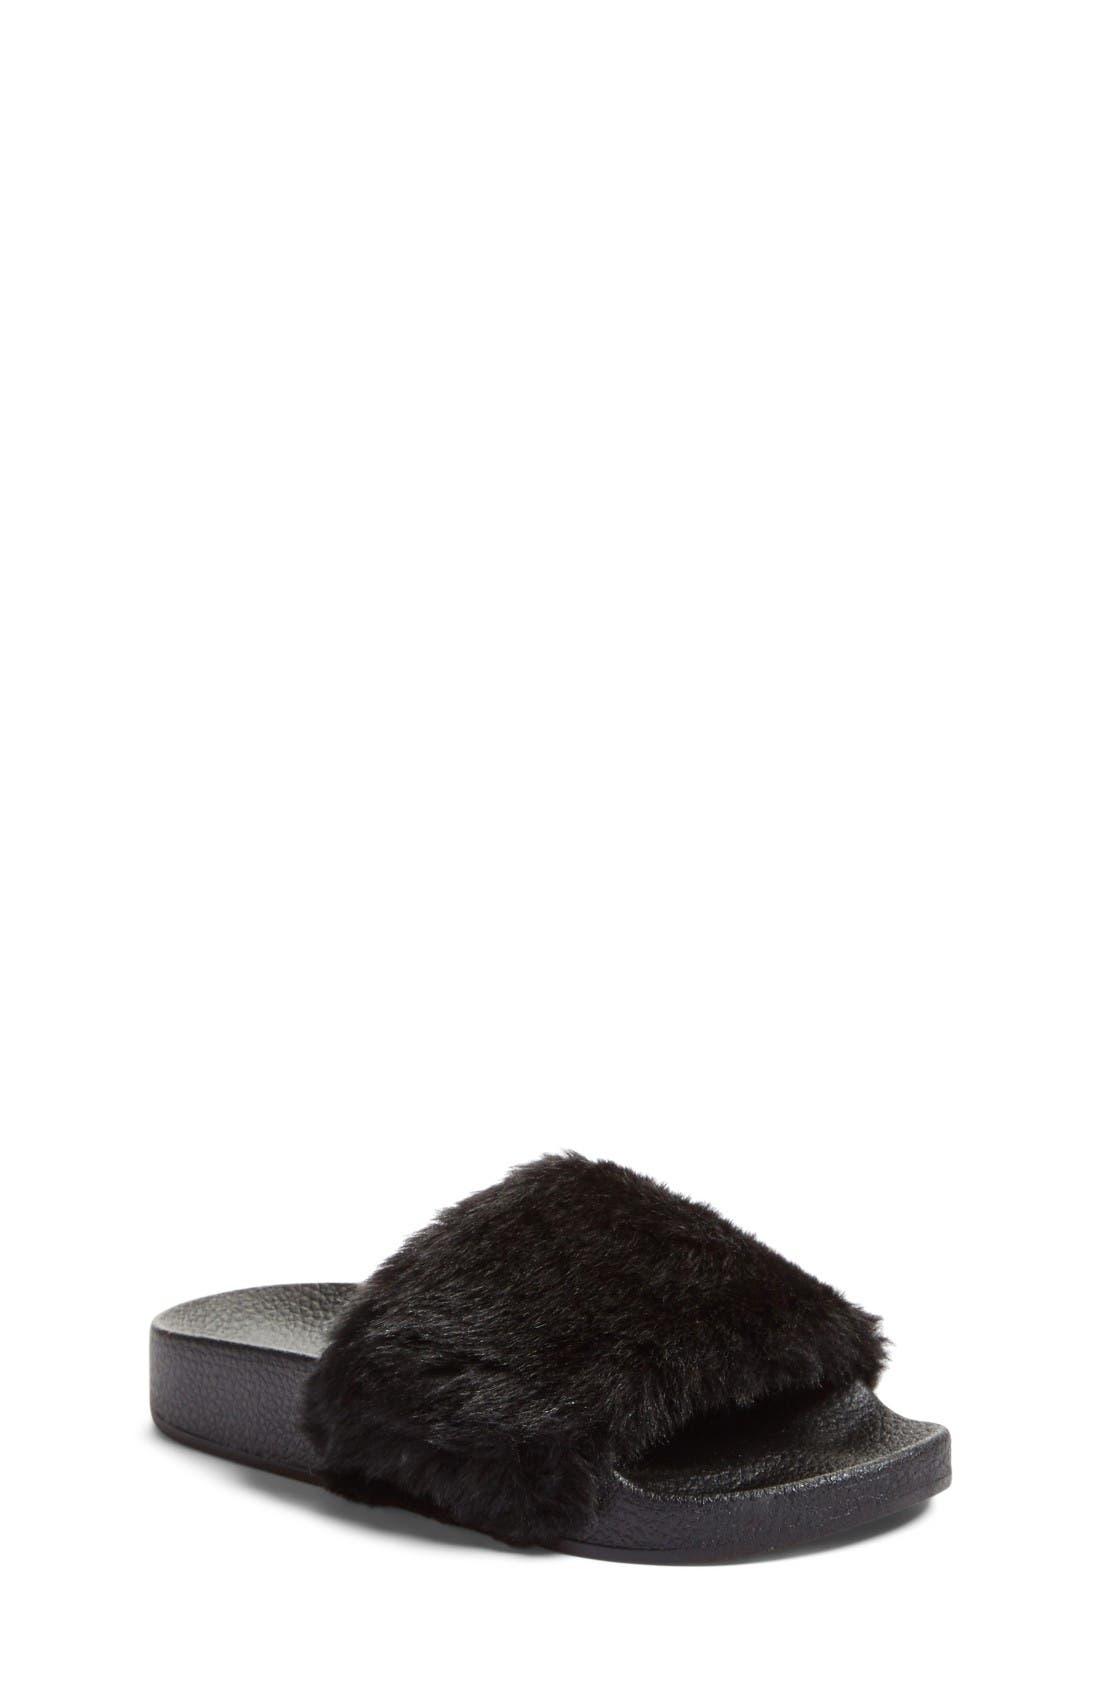 Softey Slide,                         Main,                         color, Black Faux Fur